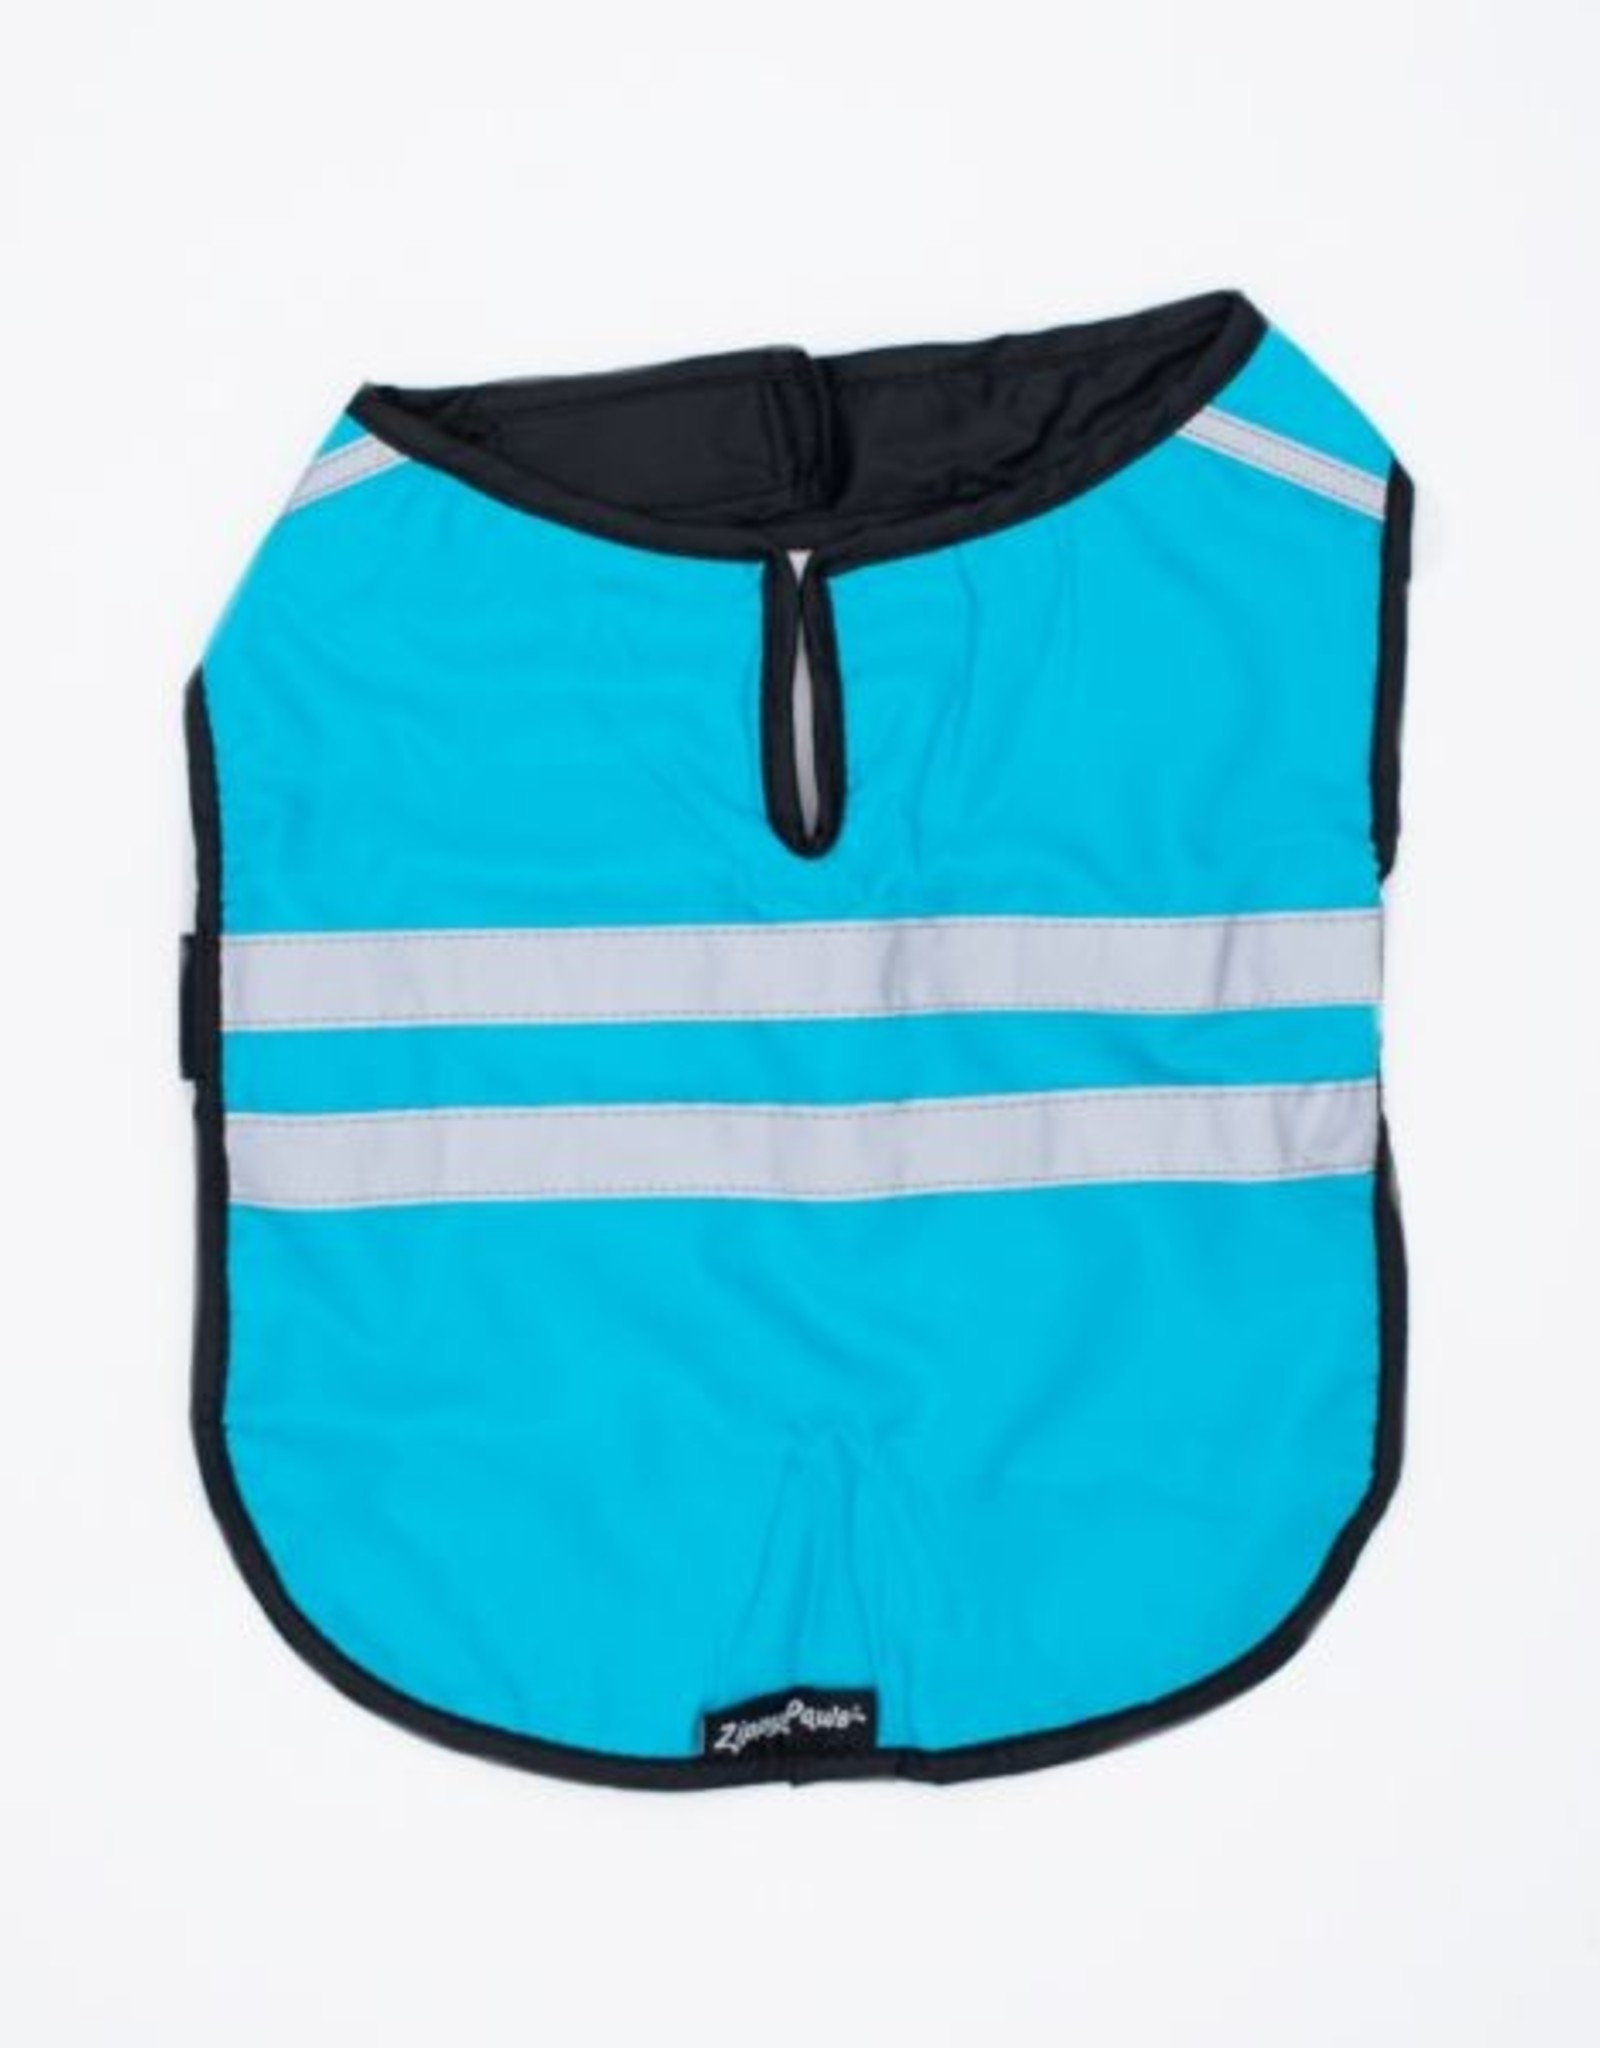 ZippyPaws Cooling Vest